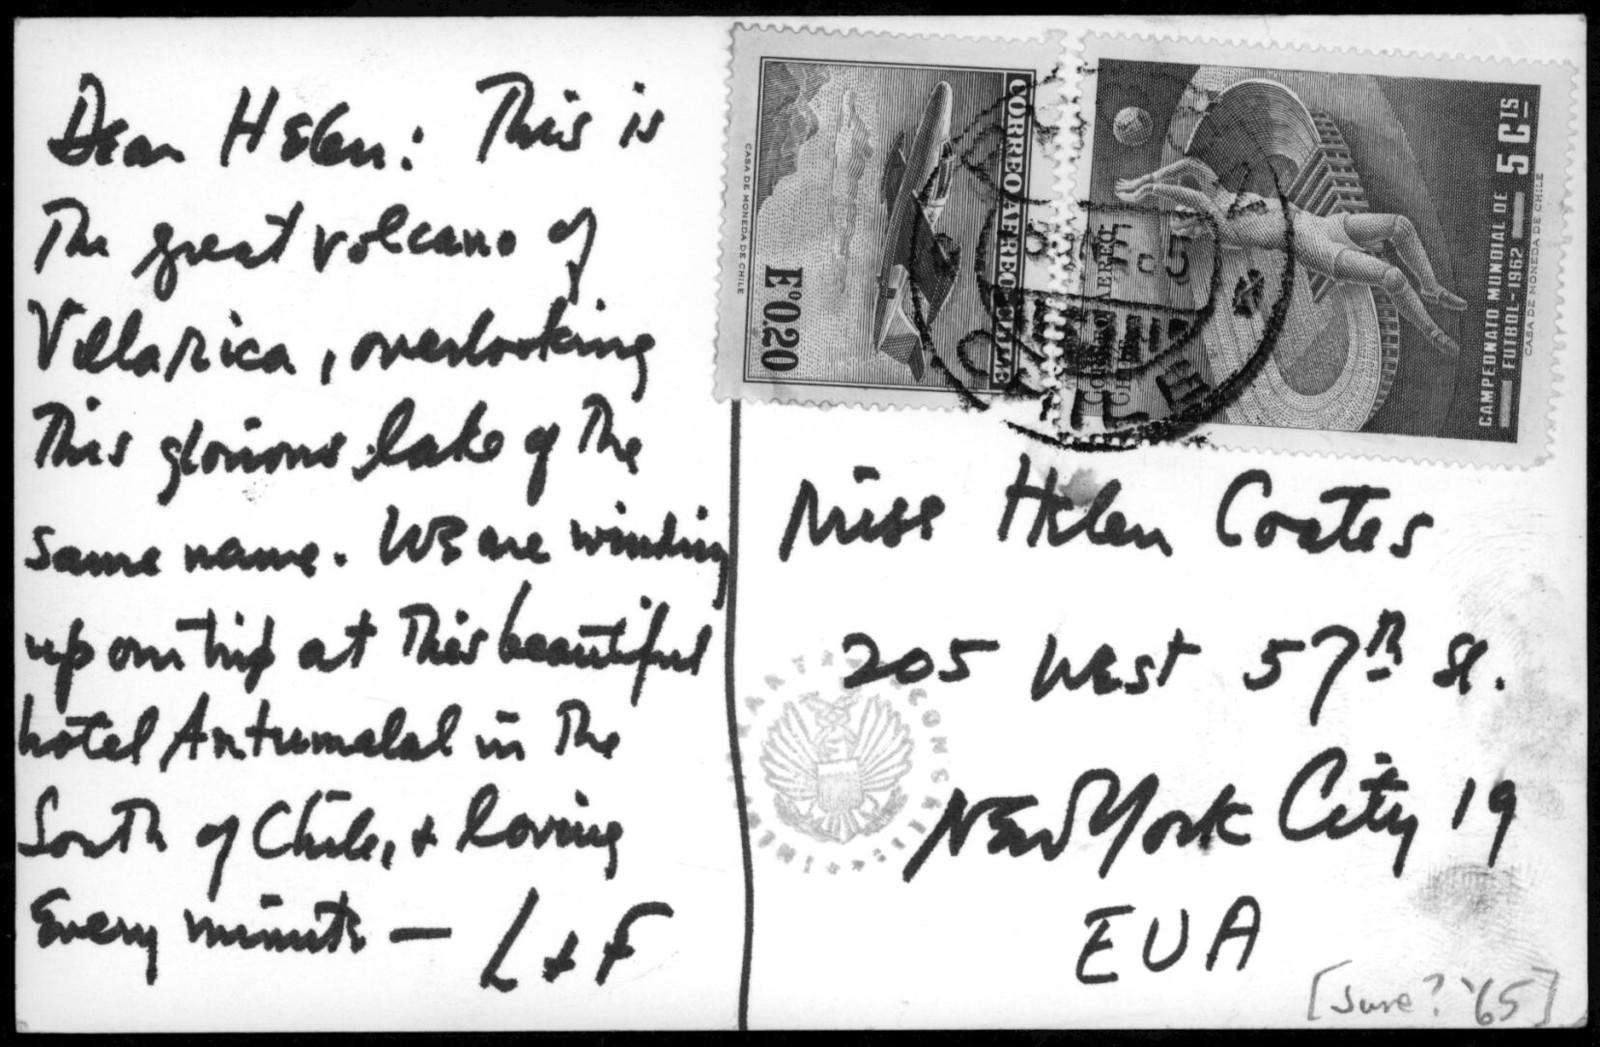 Letter from Leonard & Felicia Bernstein to Helen Coates, June 1965